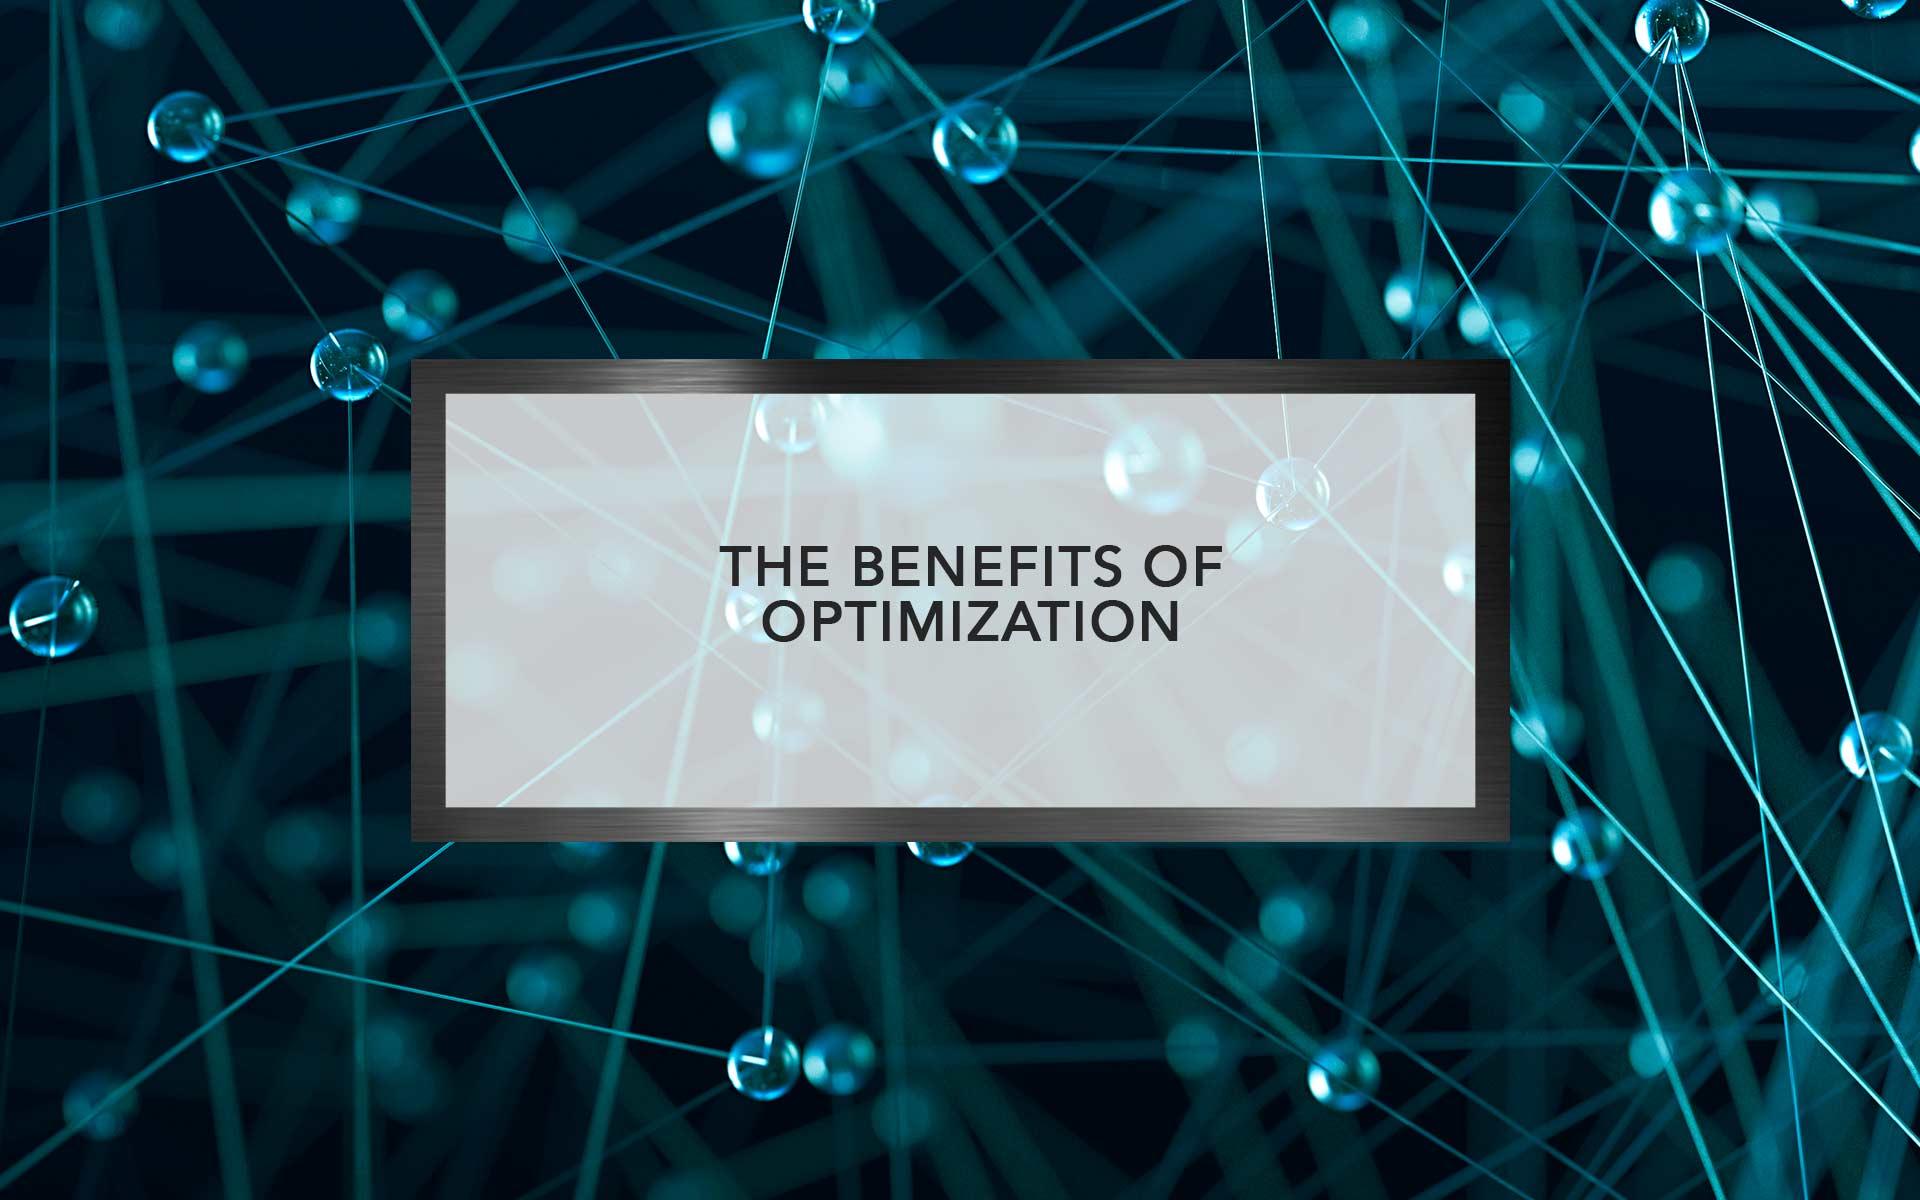 The Benefits of Optimization | Optimatics